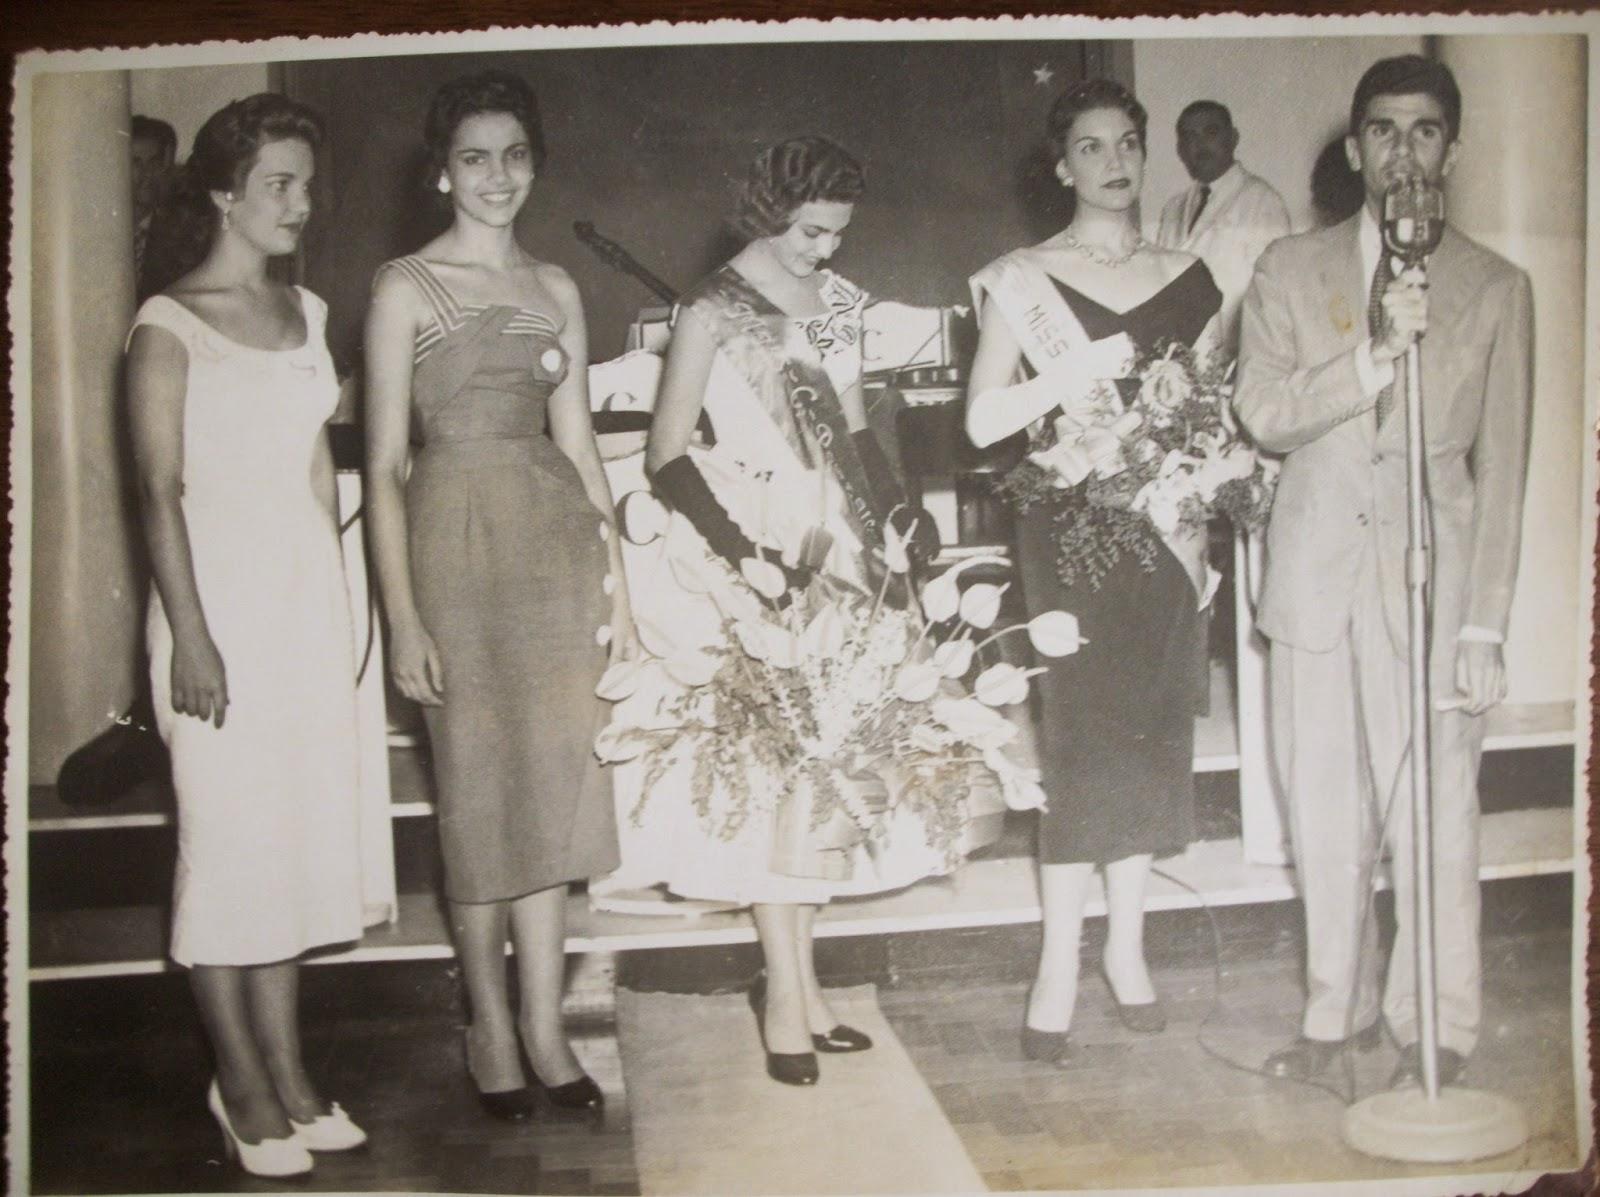 sonia maria campos, 6th runner-up de miss world 1958. primeira brasileira a participar de miss world. 100_9710